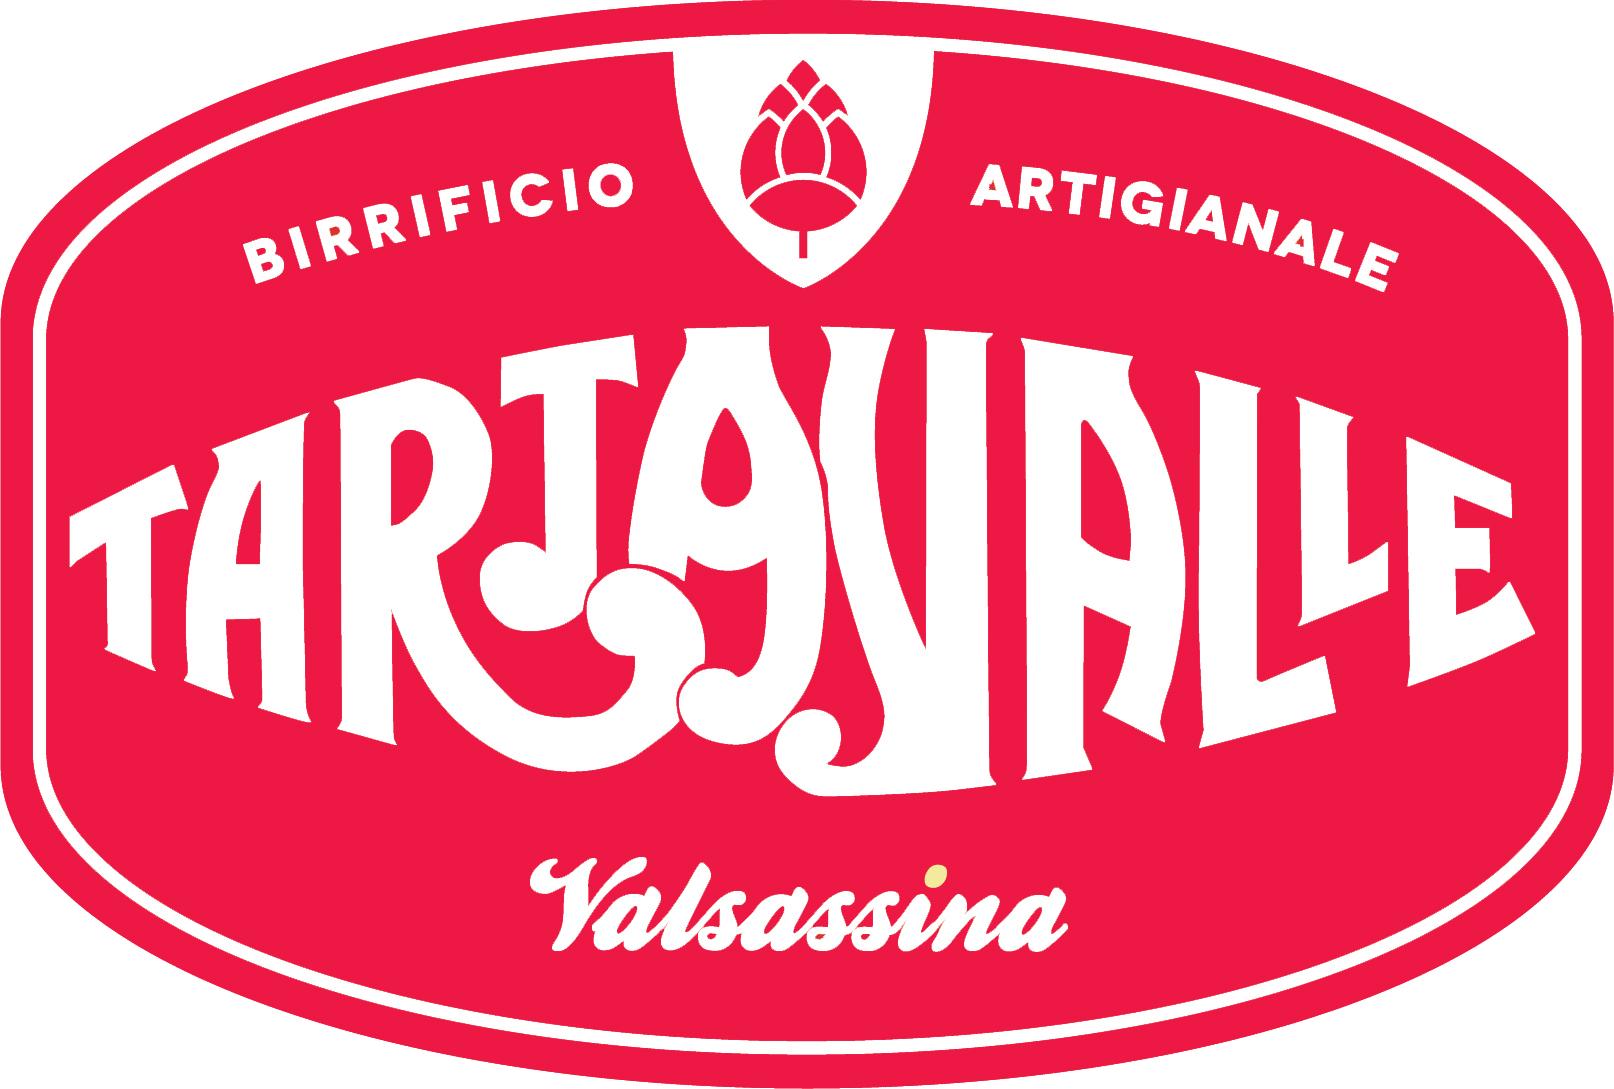 Birrificio Artigianale Tartavalle